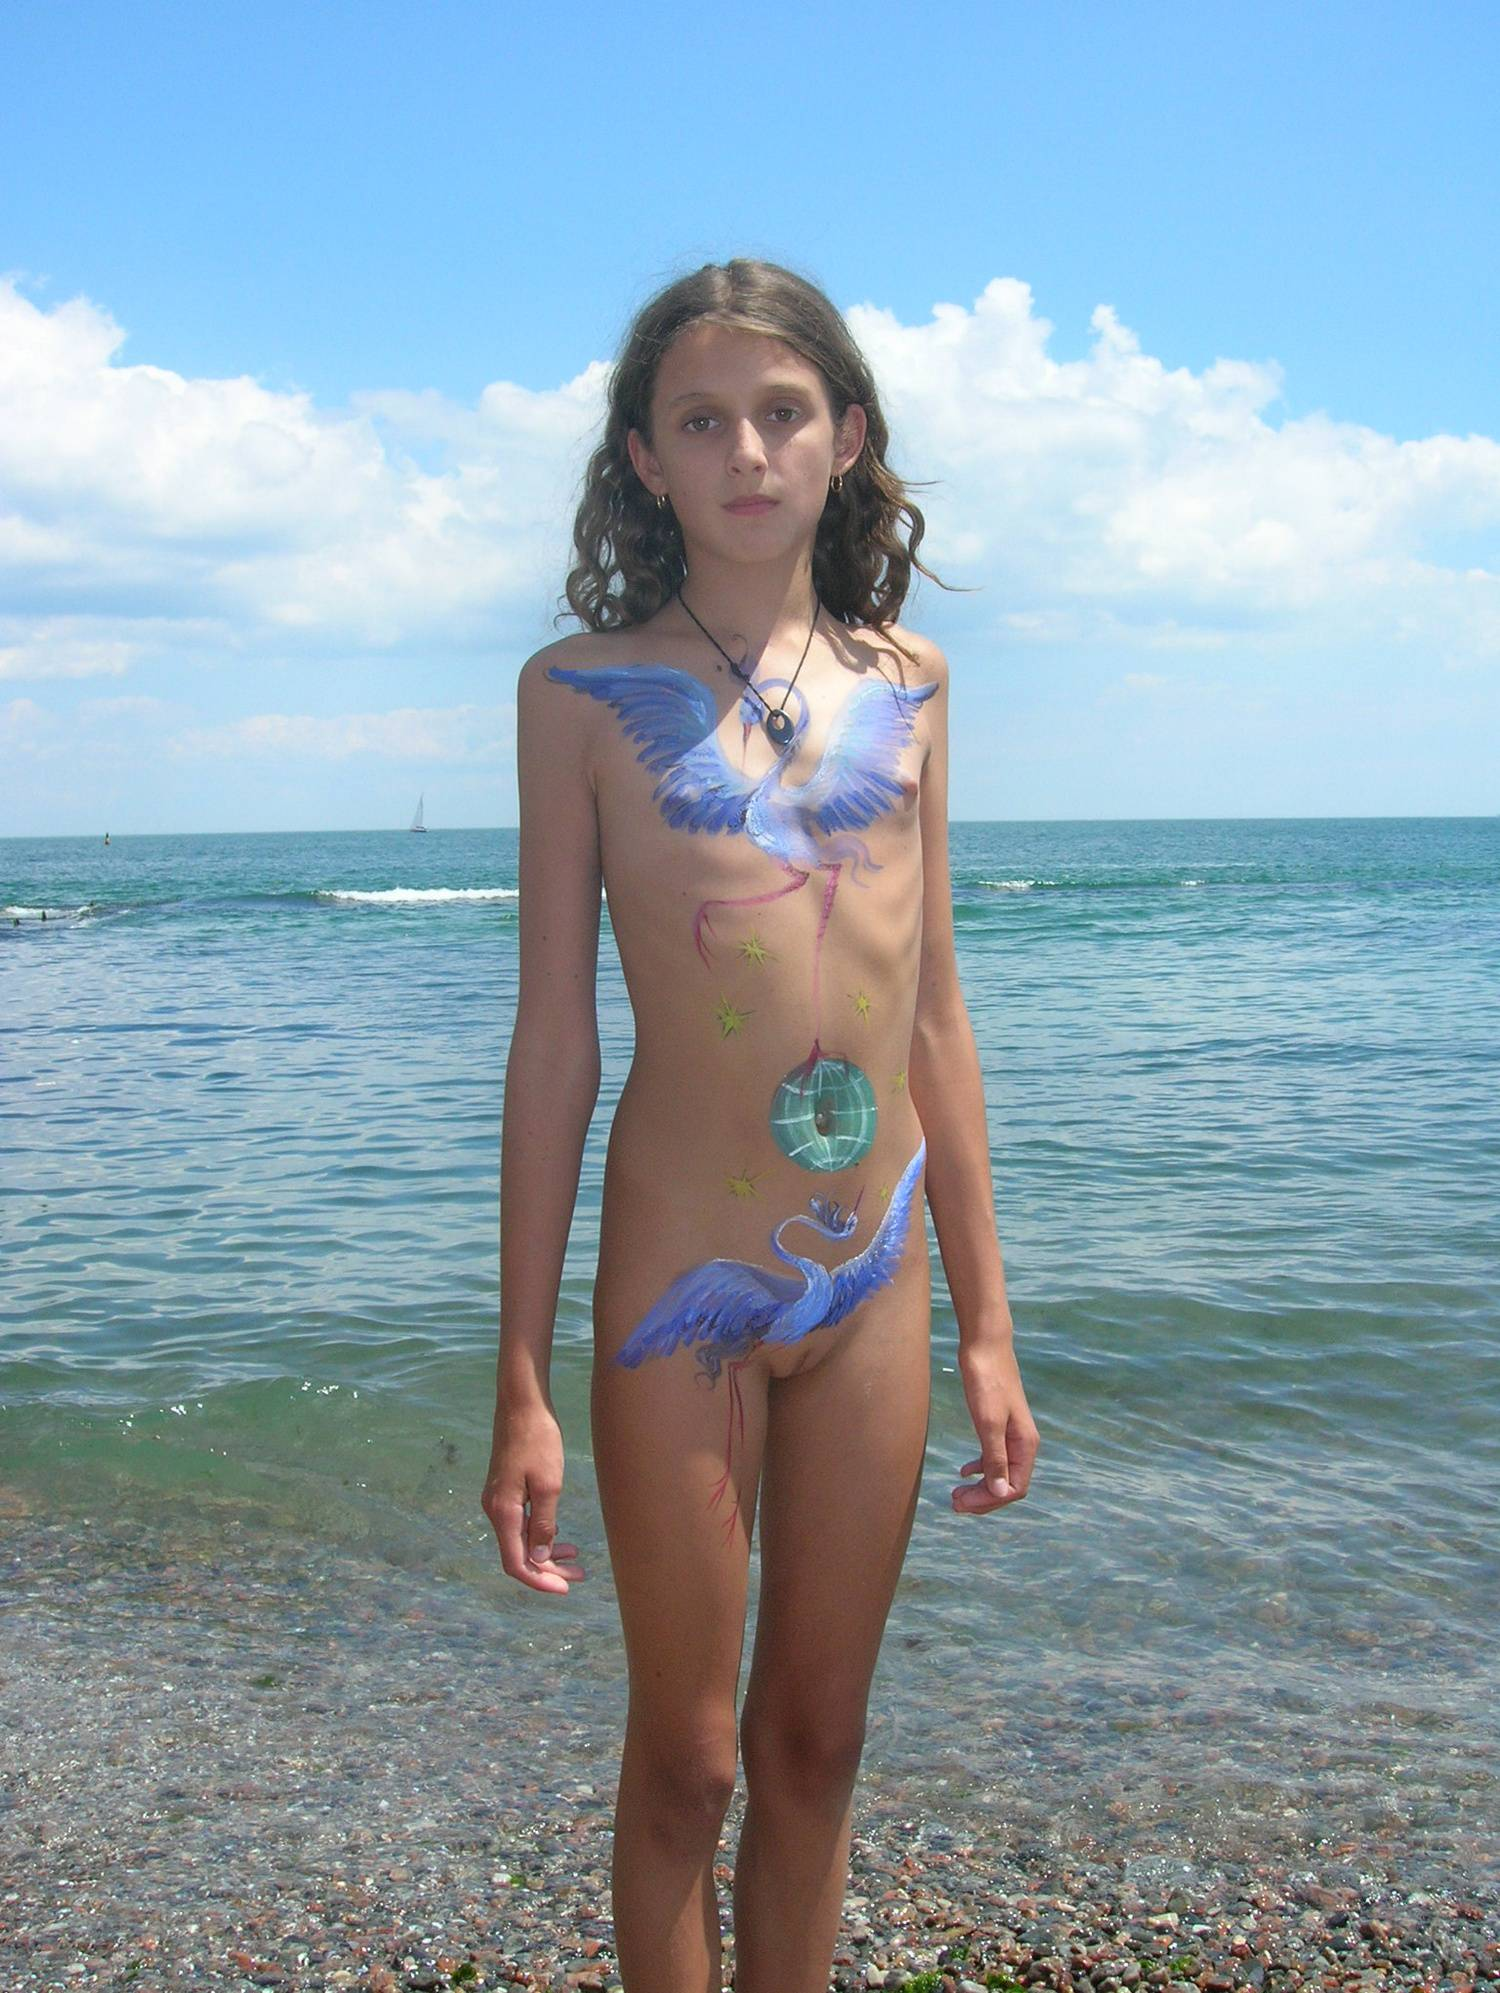 Nudist Pictures Blue Stork Bodywork Girl - 2